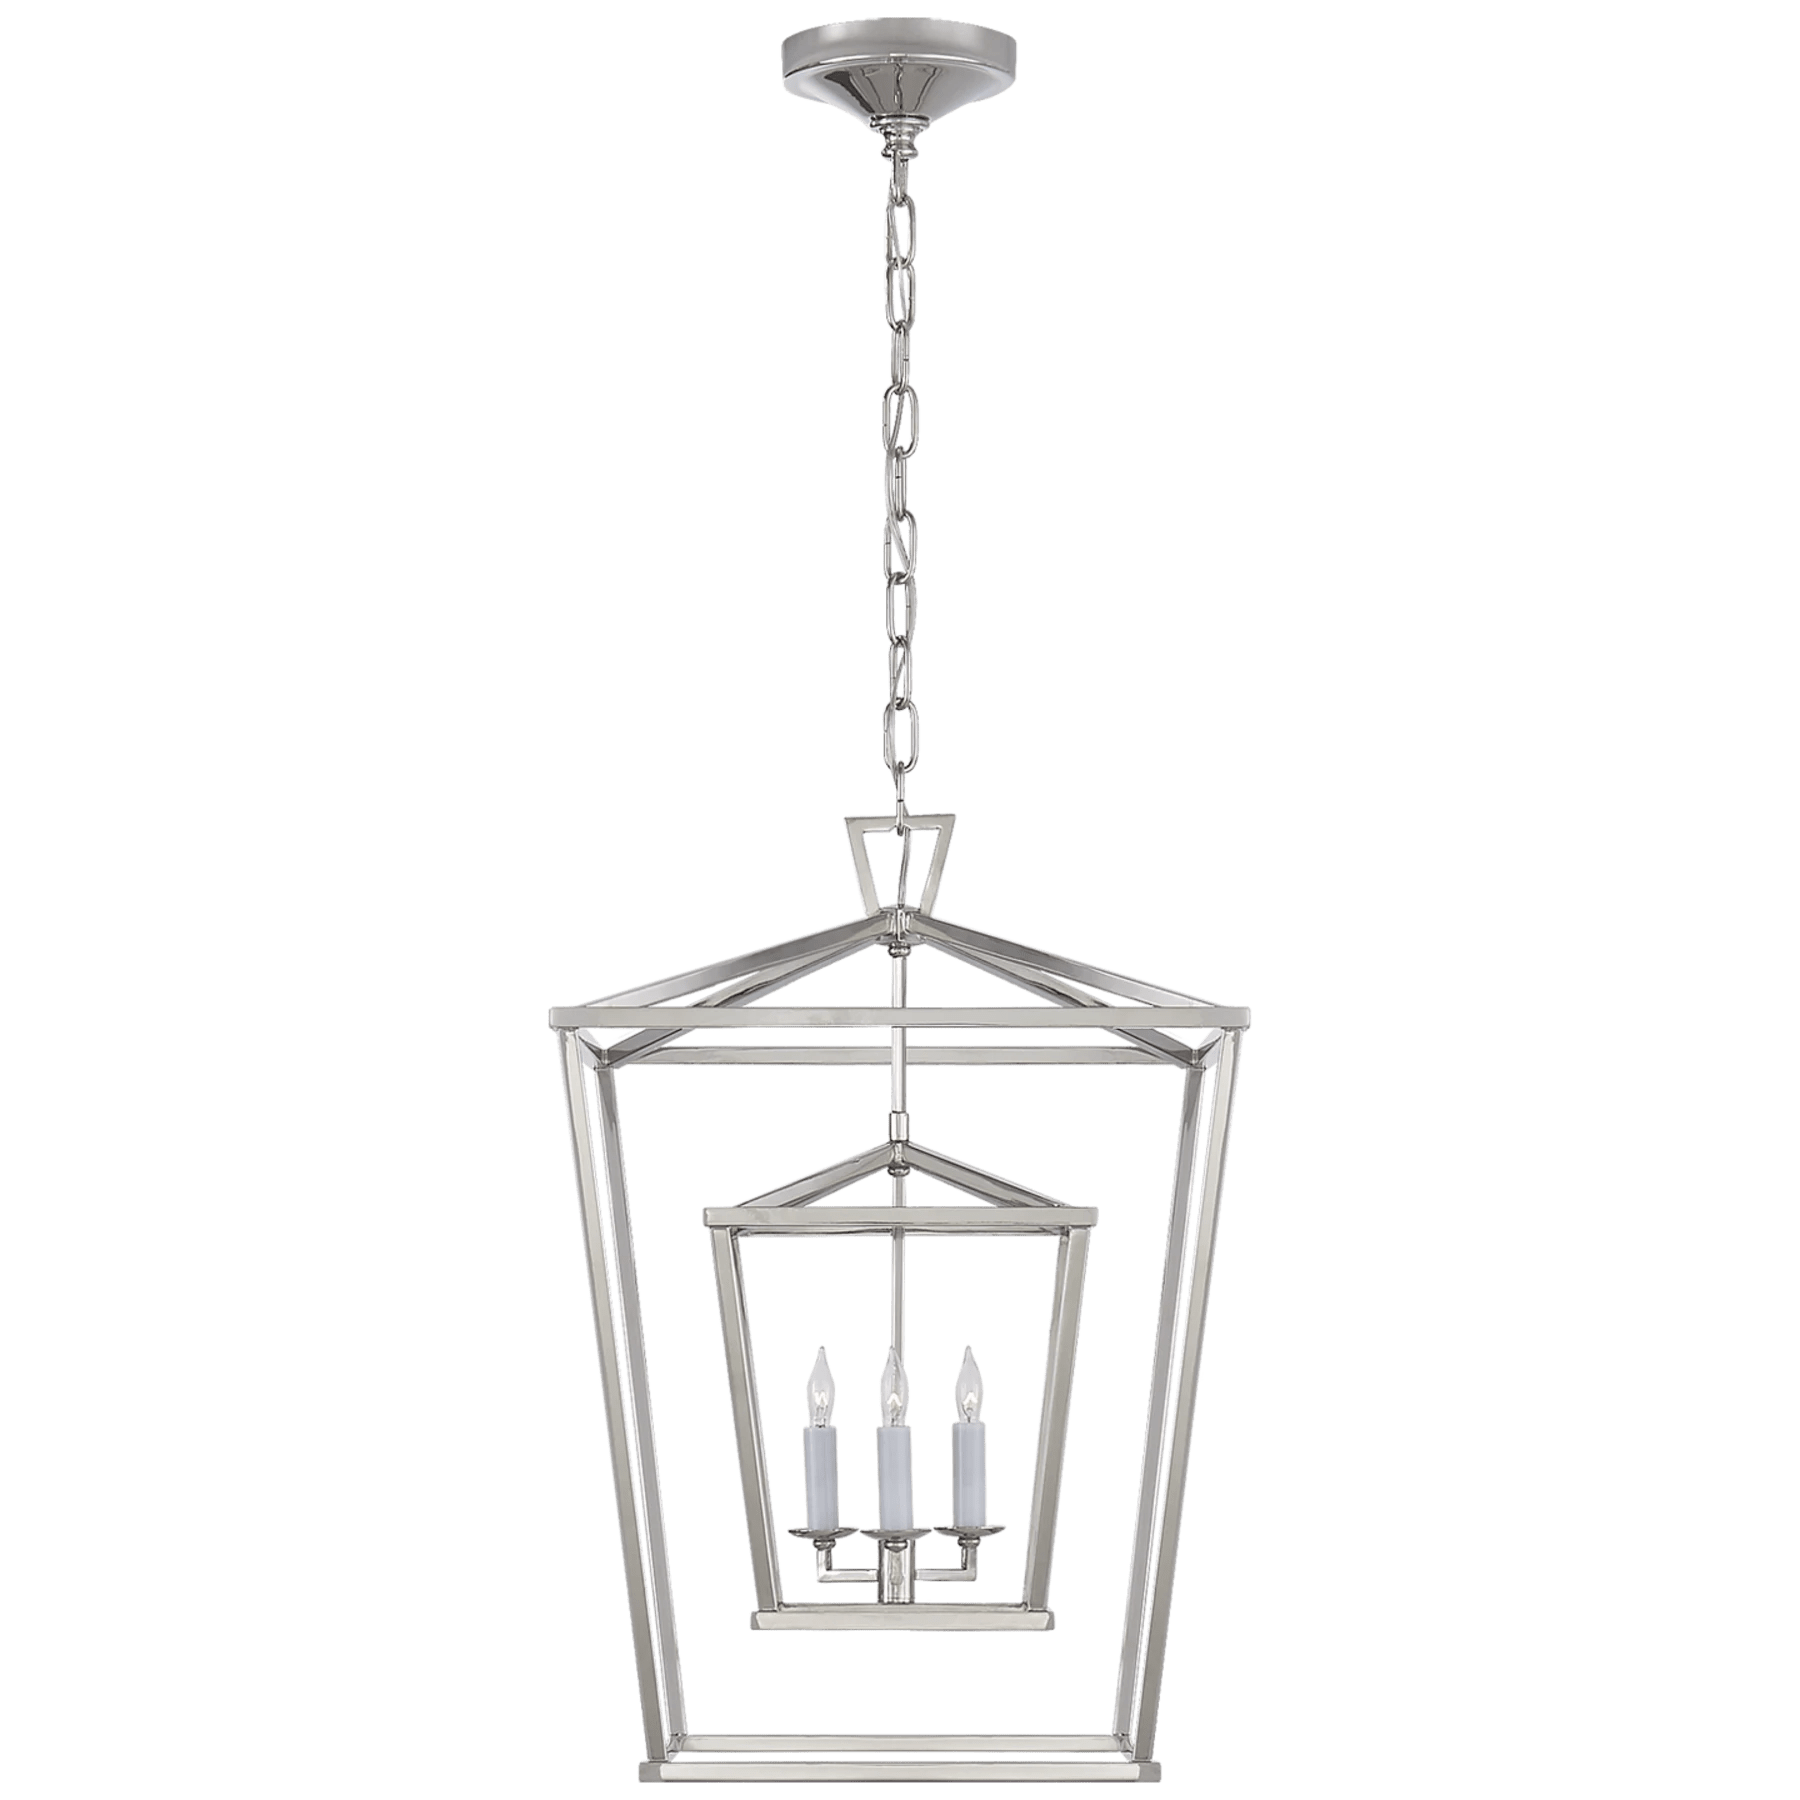 Darlana Medium Double Cage Lantern